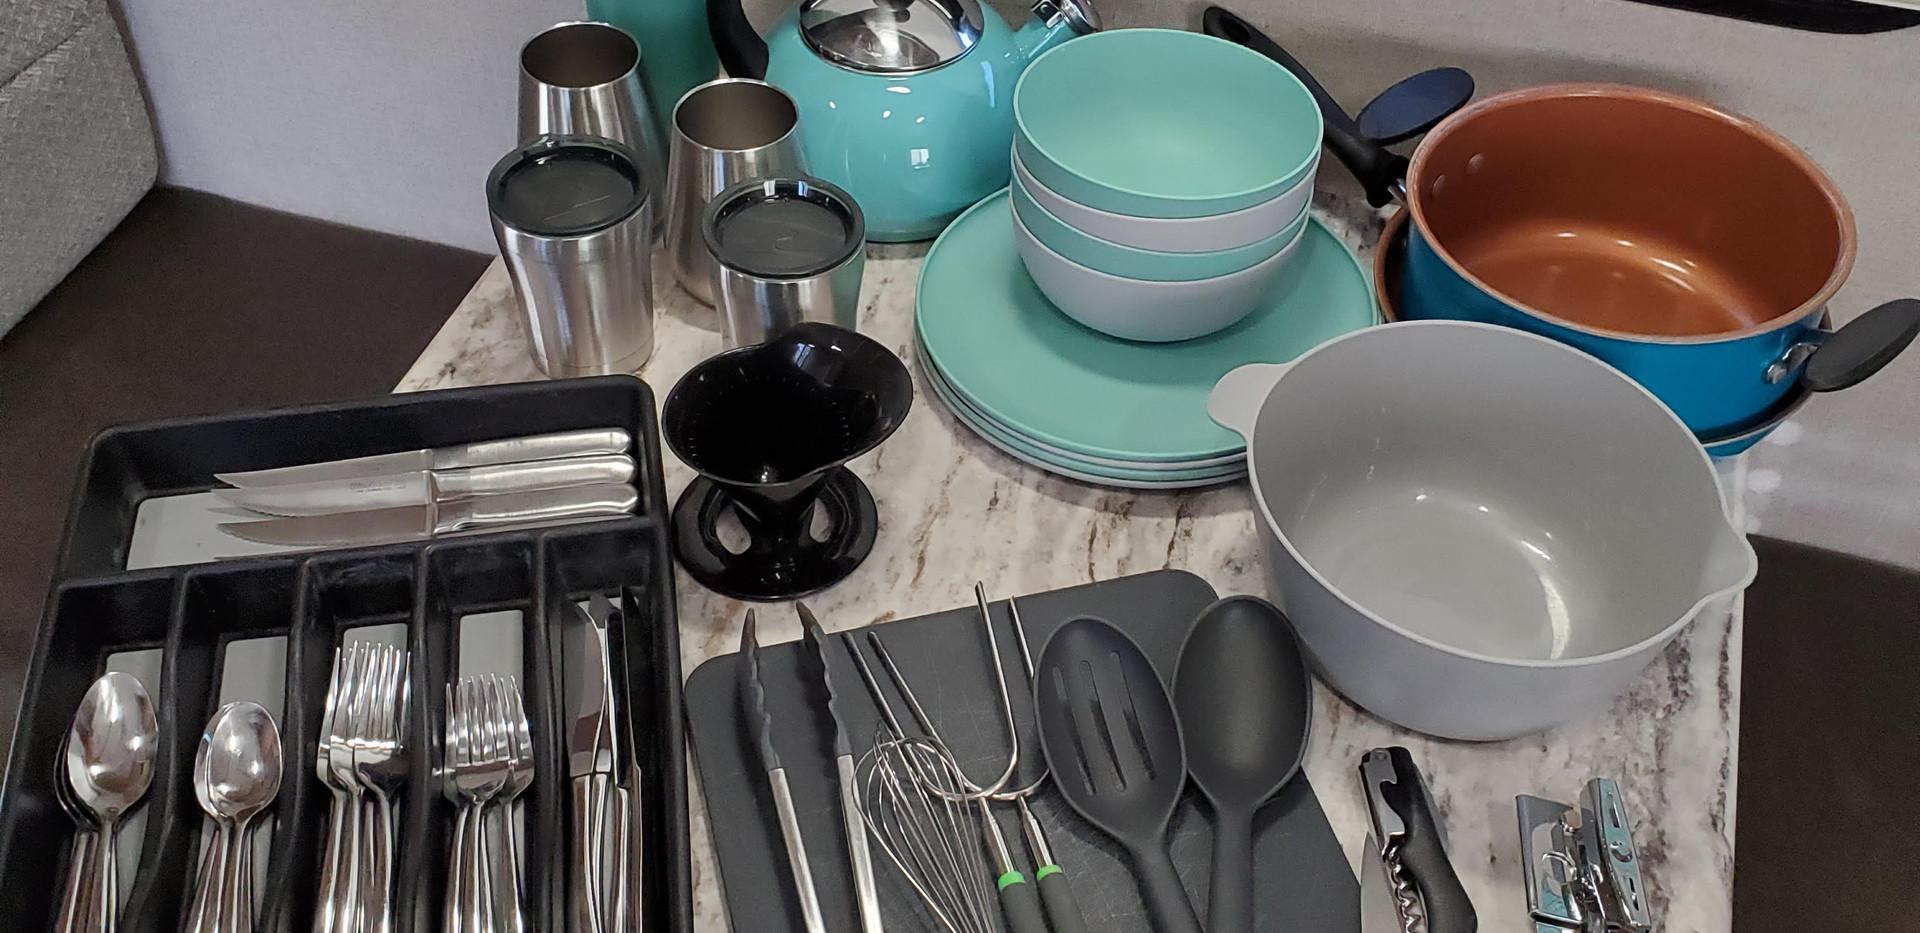 Kodiak Rental - Dish Set for Four.jpg